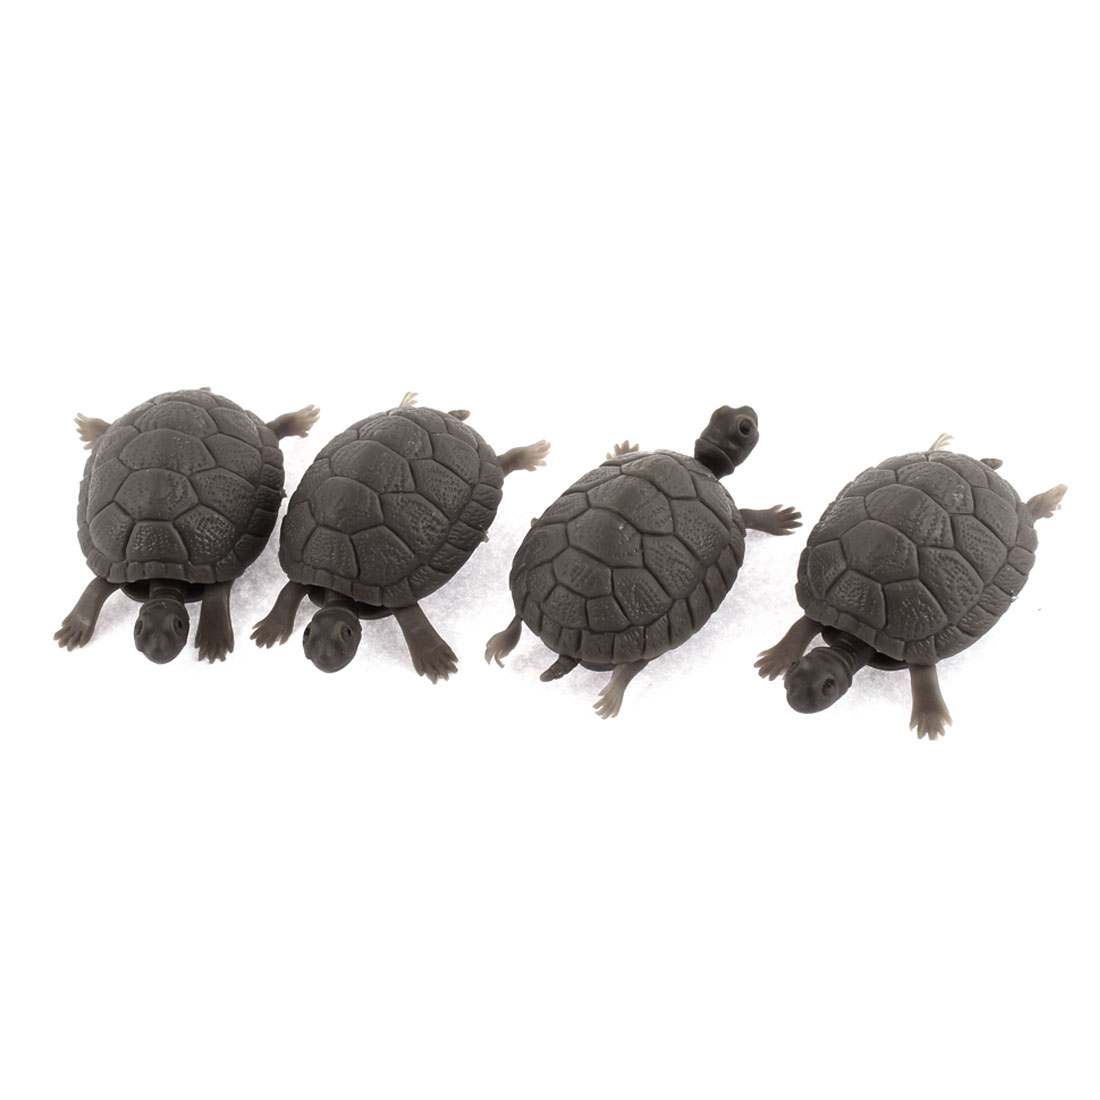 Aquarium Gray Plastic Tortoise Shape Decorative Ornament 4pcs